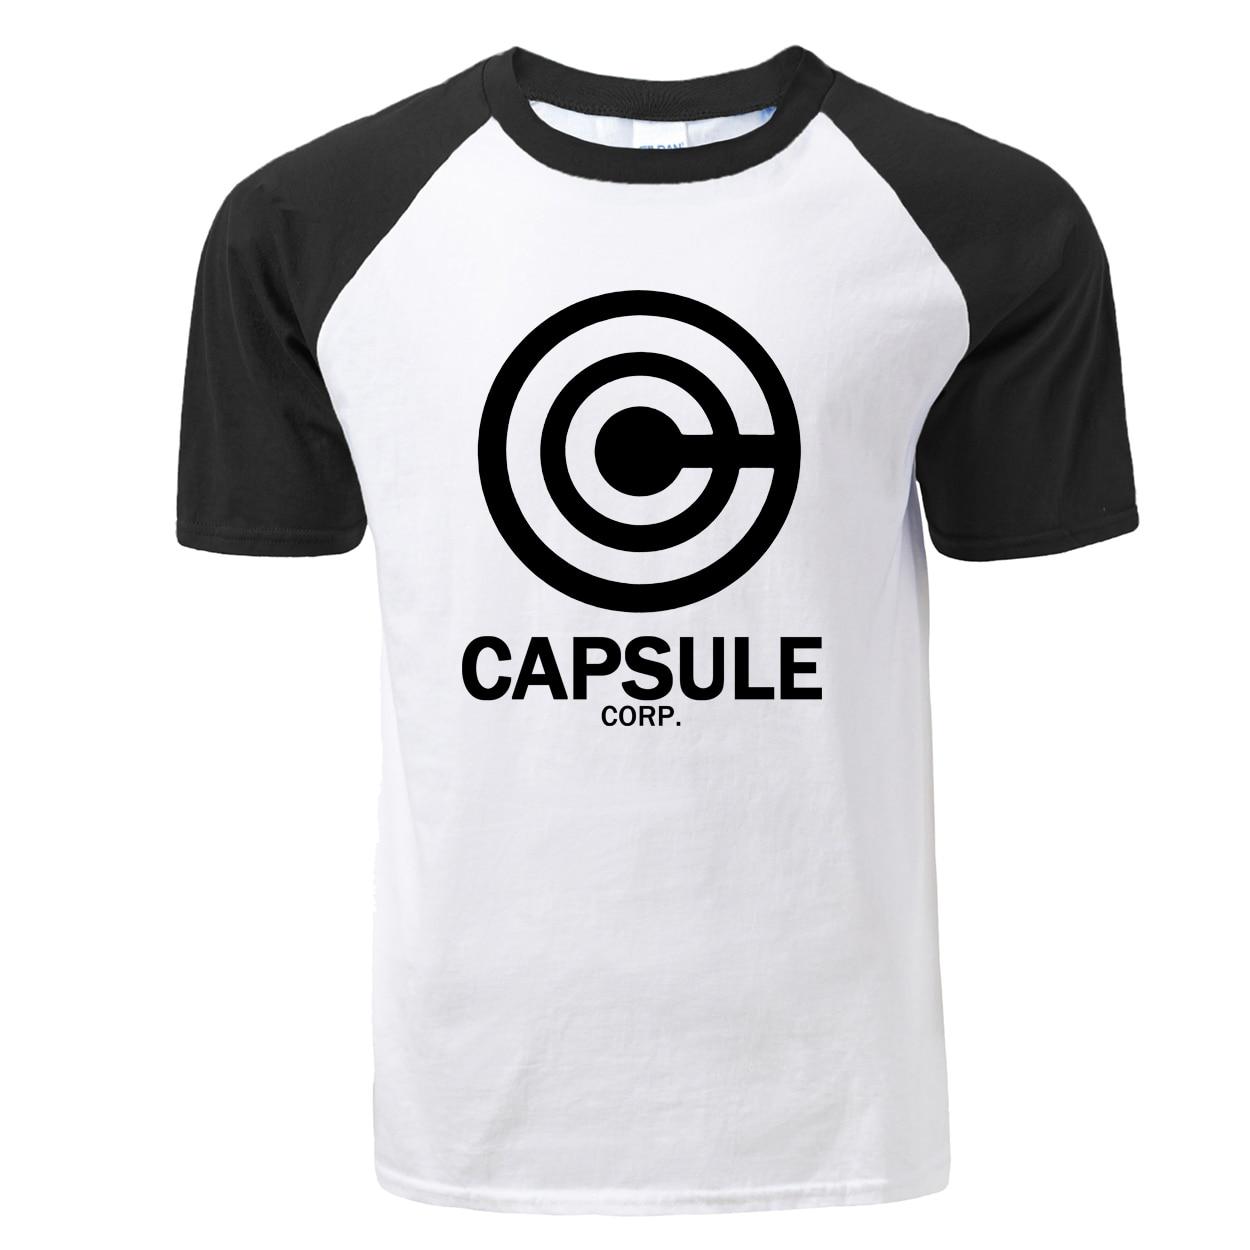 Anime Dragon Ball Z CAPSULE CORP. Tshirt 2019 Summer New Short Sleeve Raglan T Shirts Casual Cotton Men T-shirt For Anime Fans